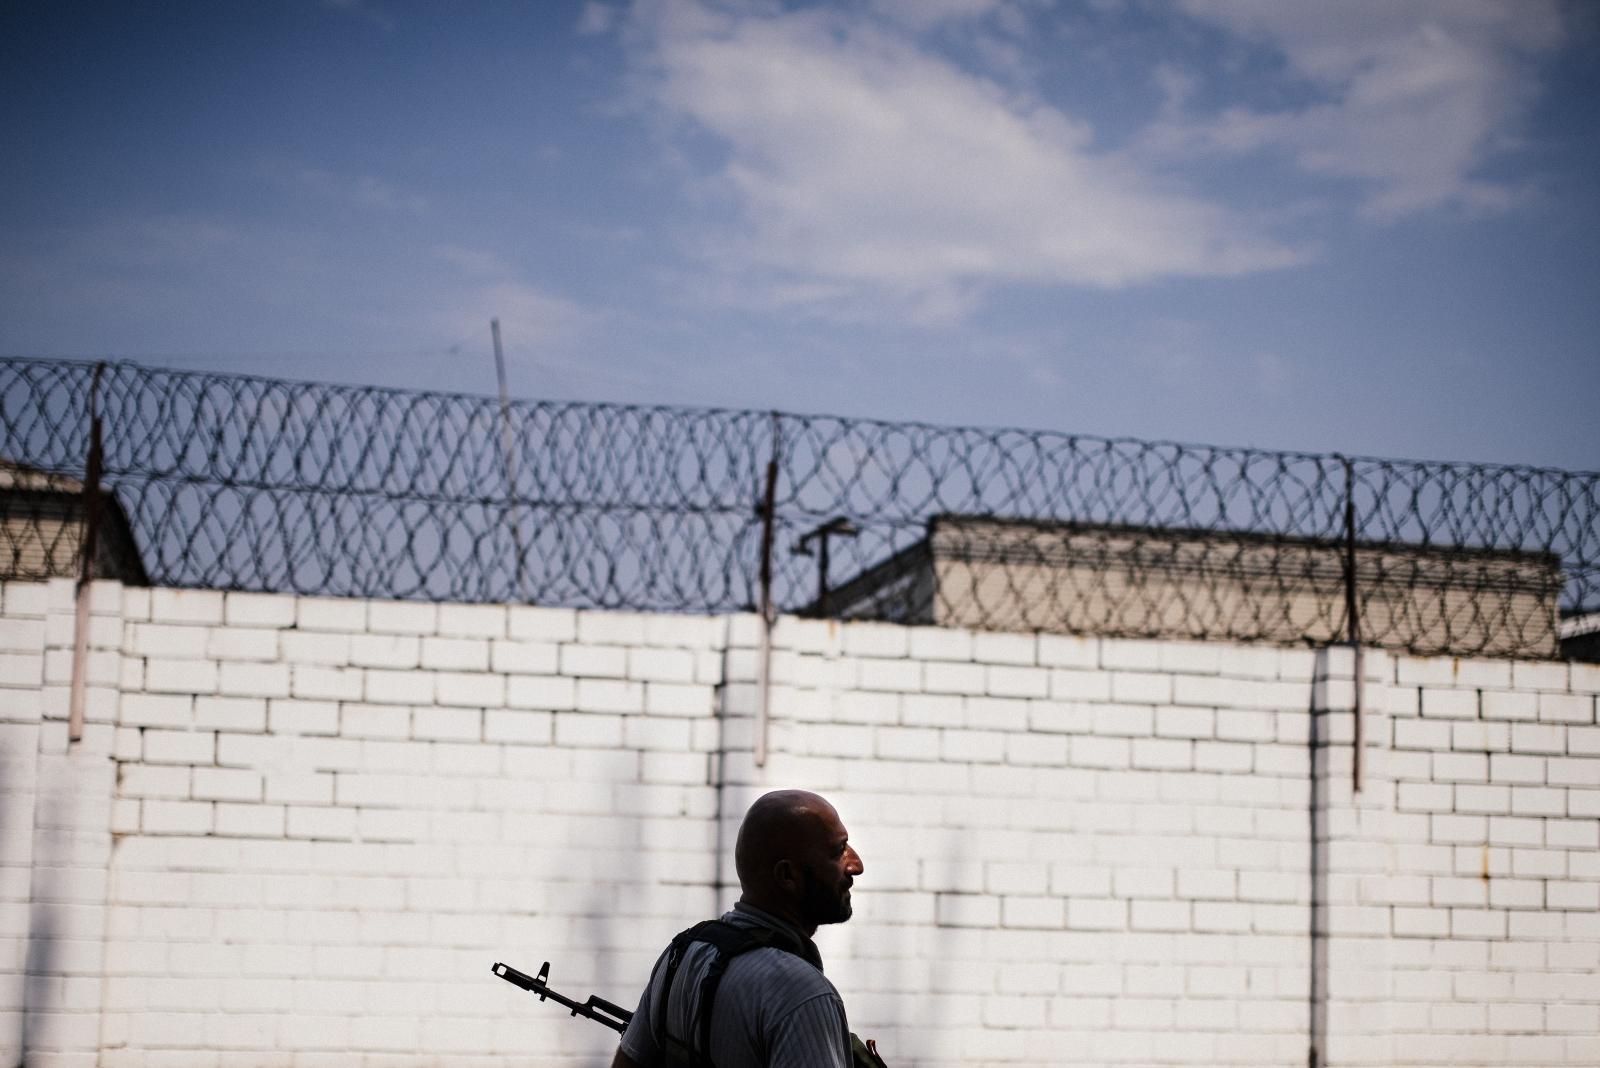 Donetsk prison